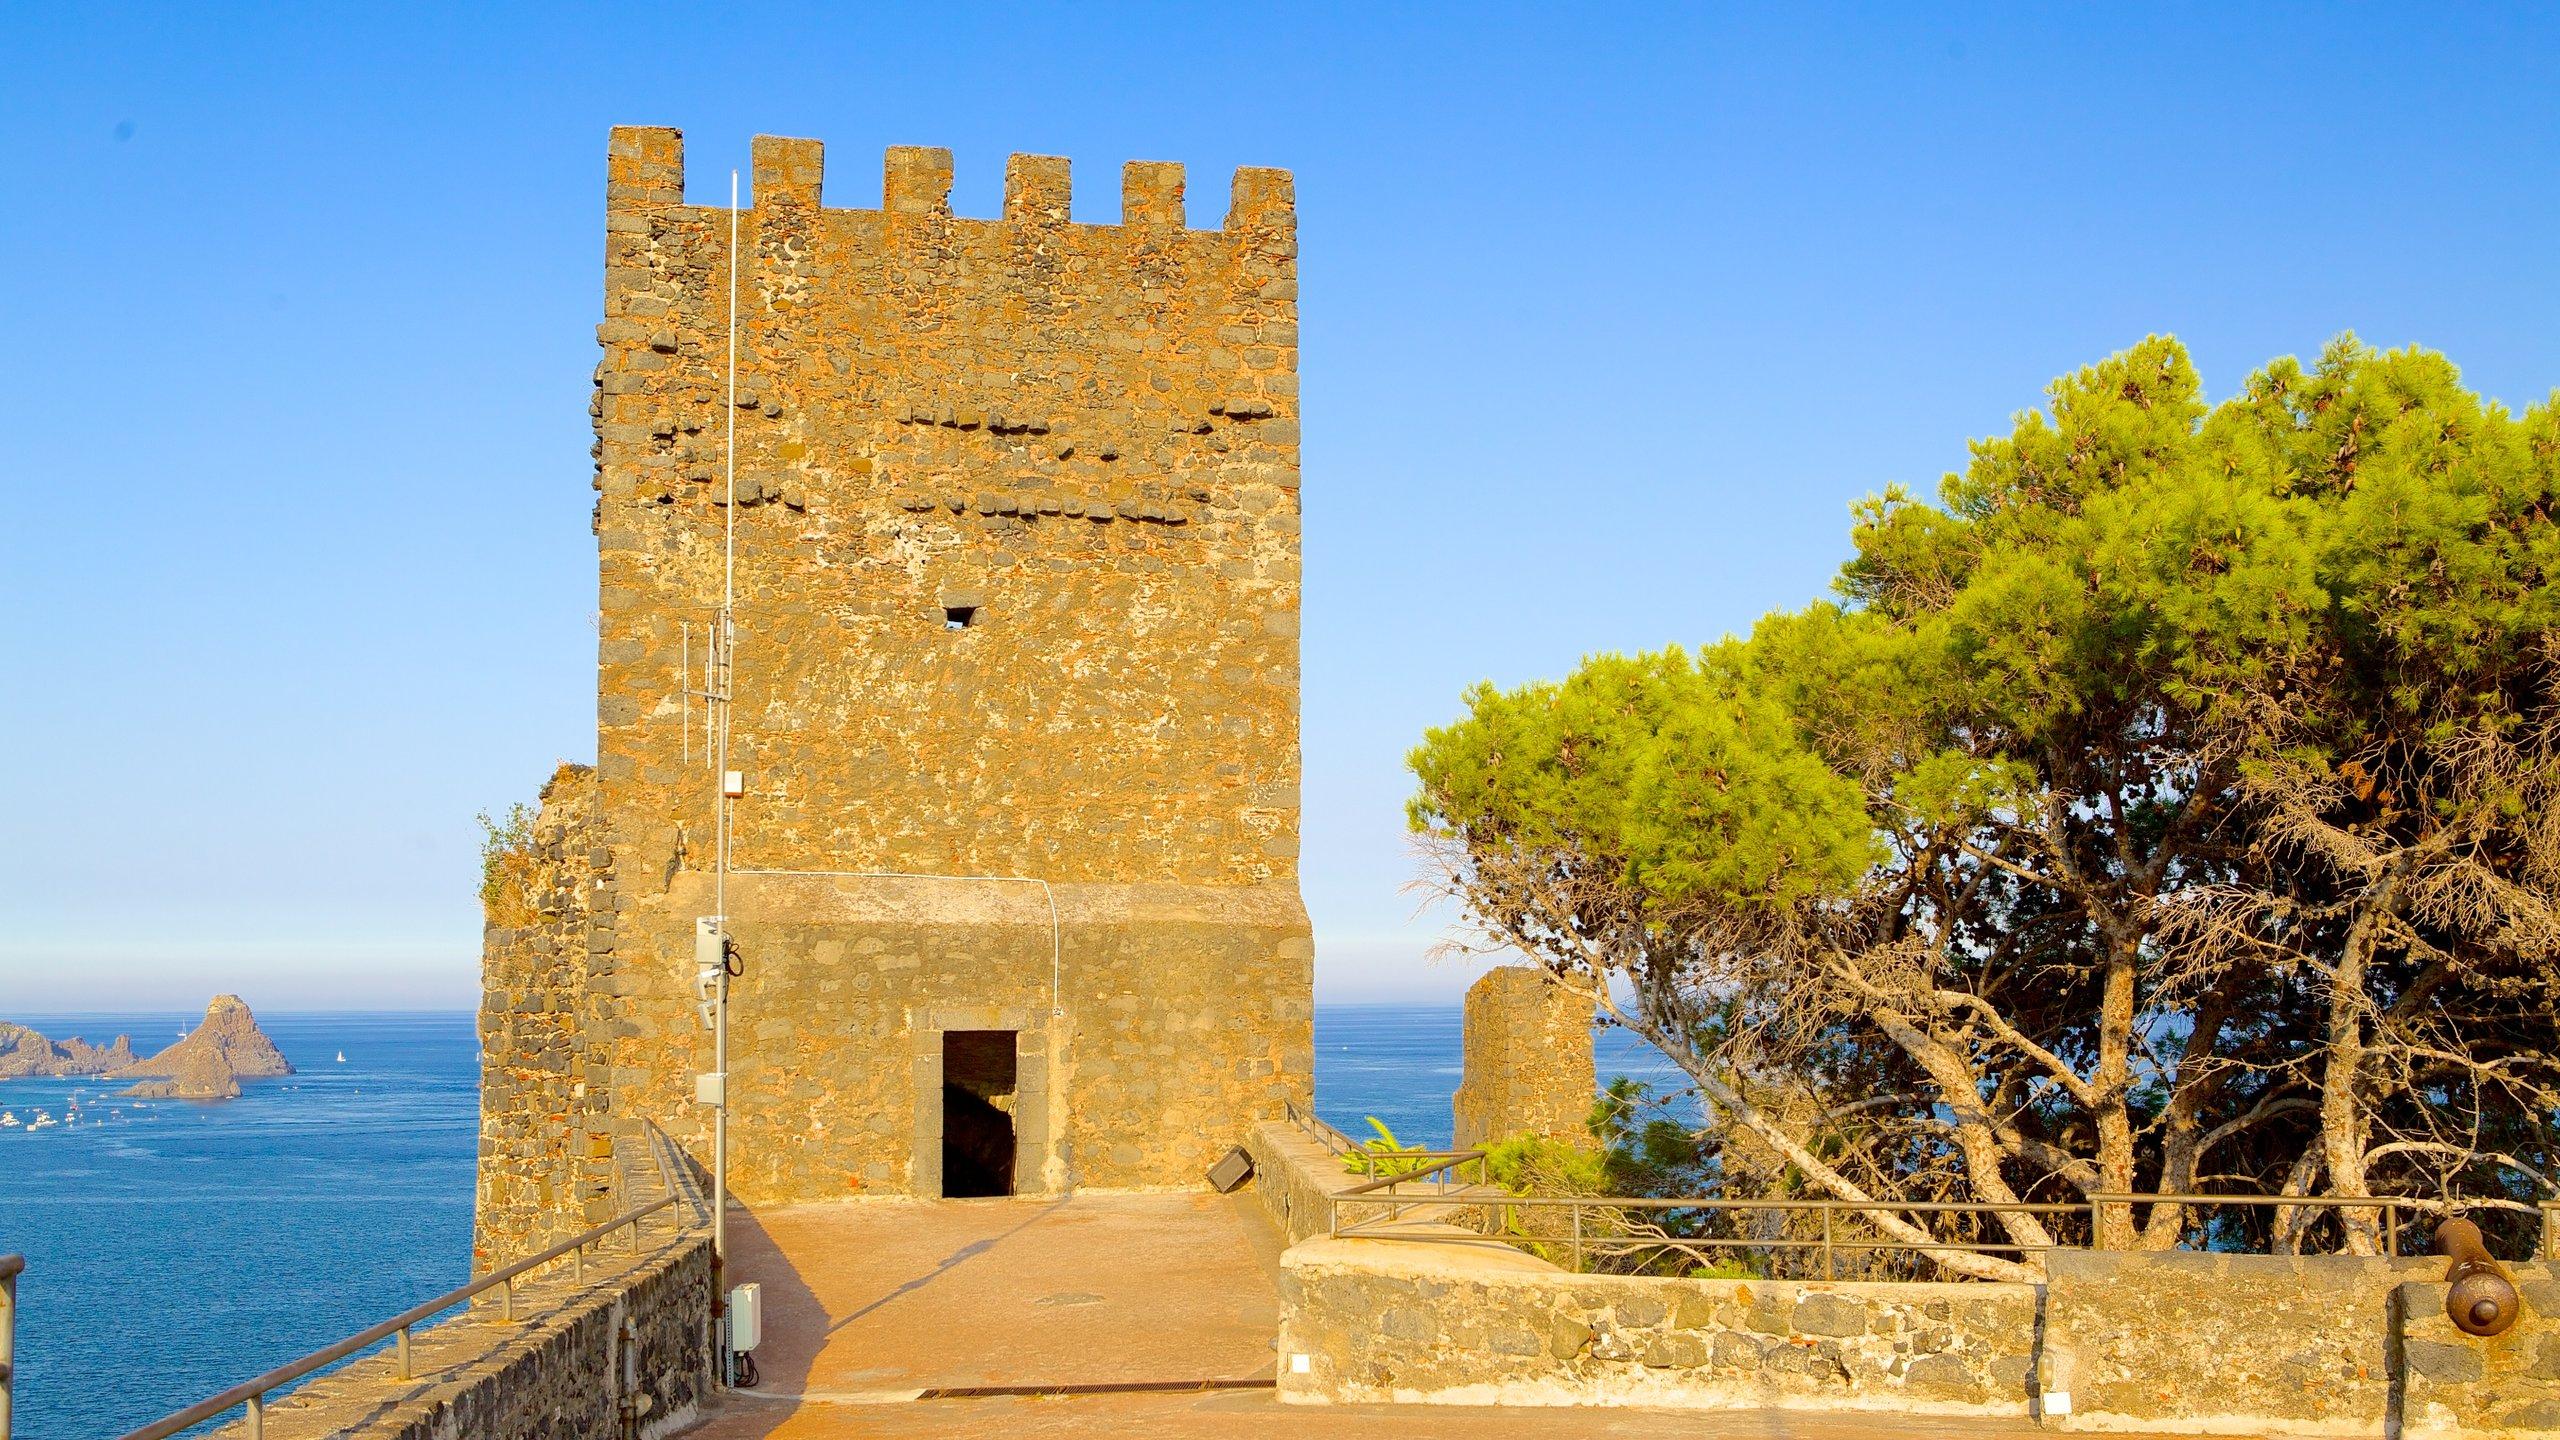 Aci Castello, Sicily, Italy